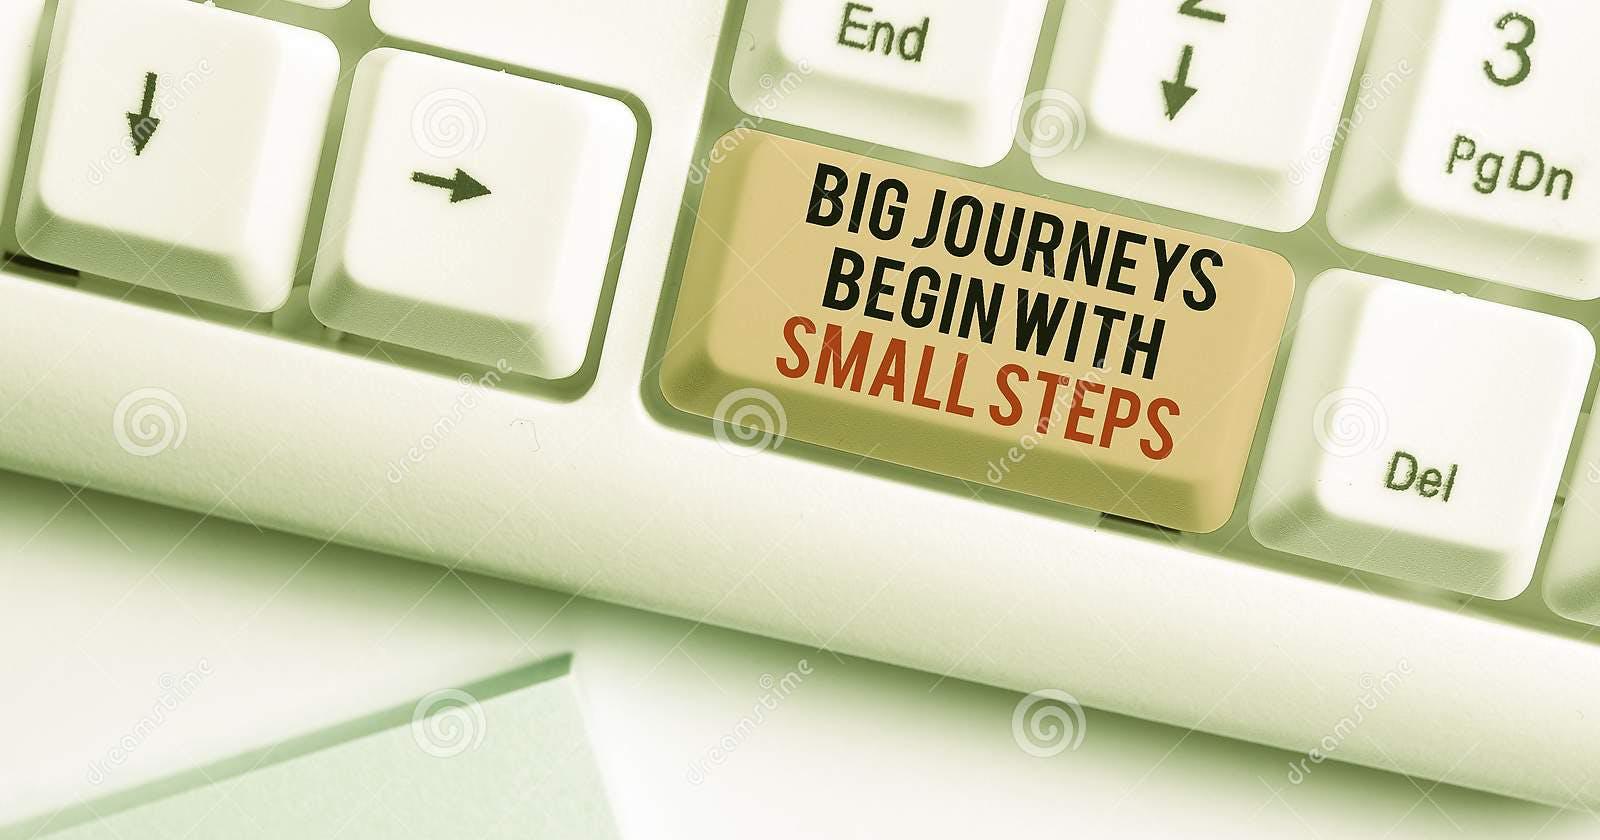 Starting my journey as a web developer.